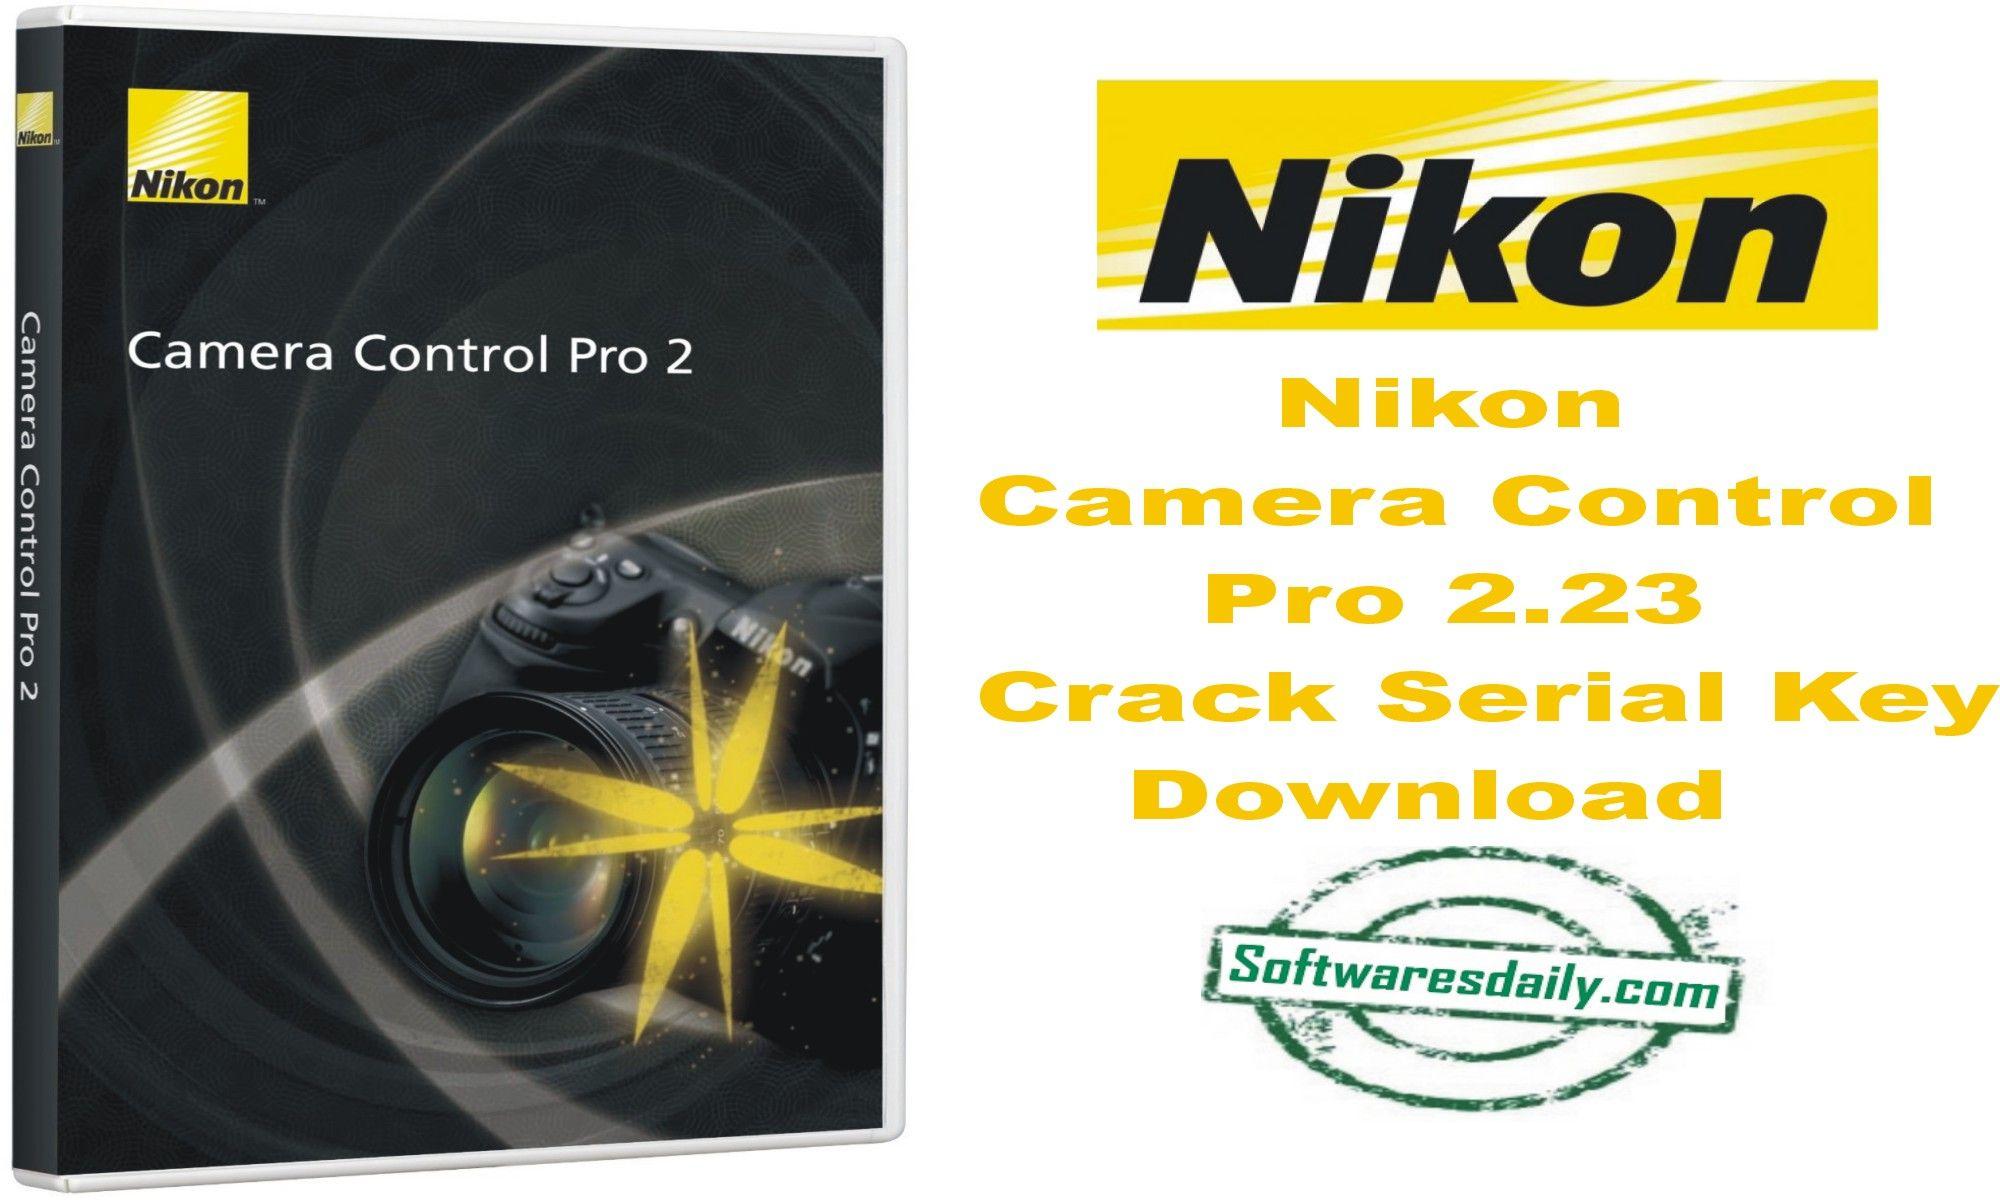 Nikon Camera Control Pro 2 23 Crack Serial Key Download